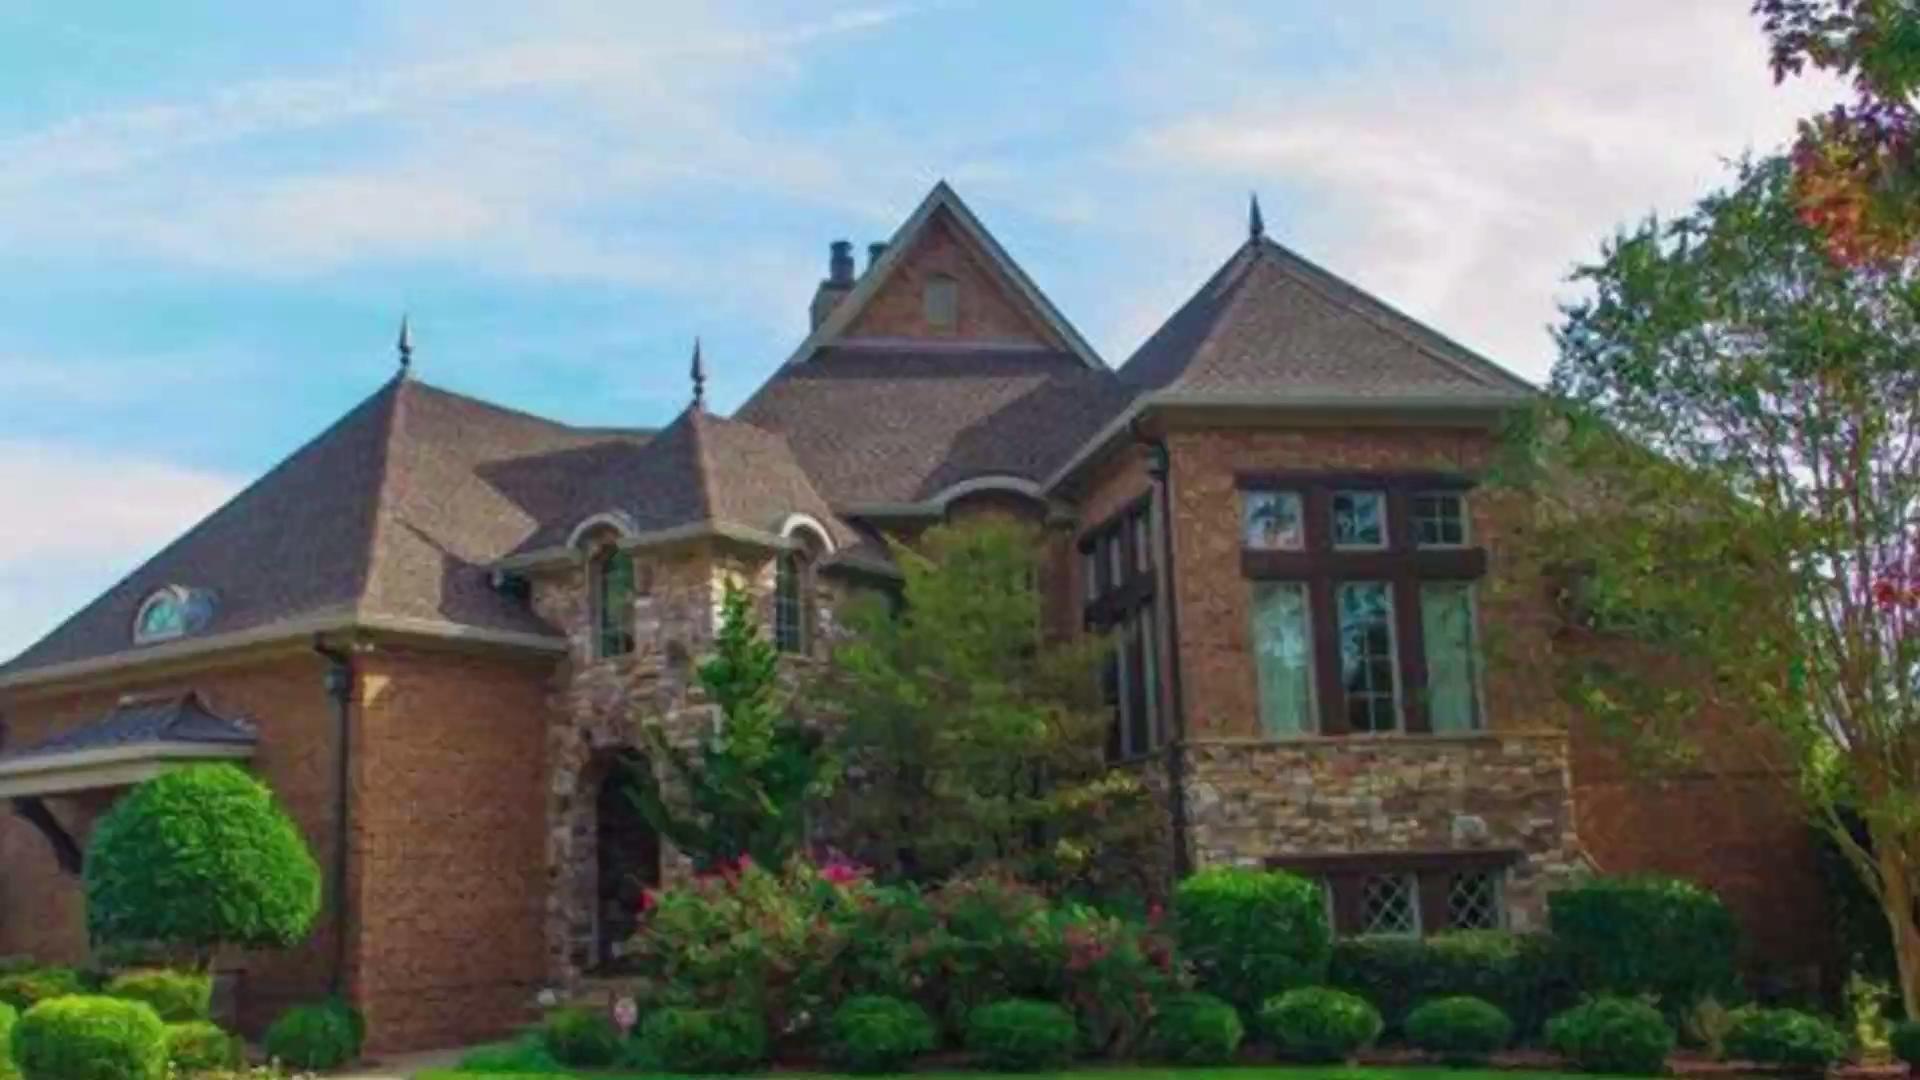 This home has championship-level charm!